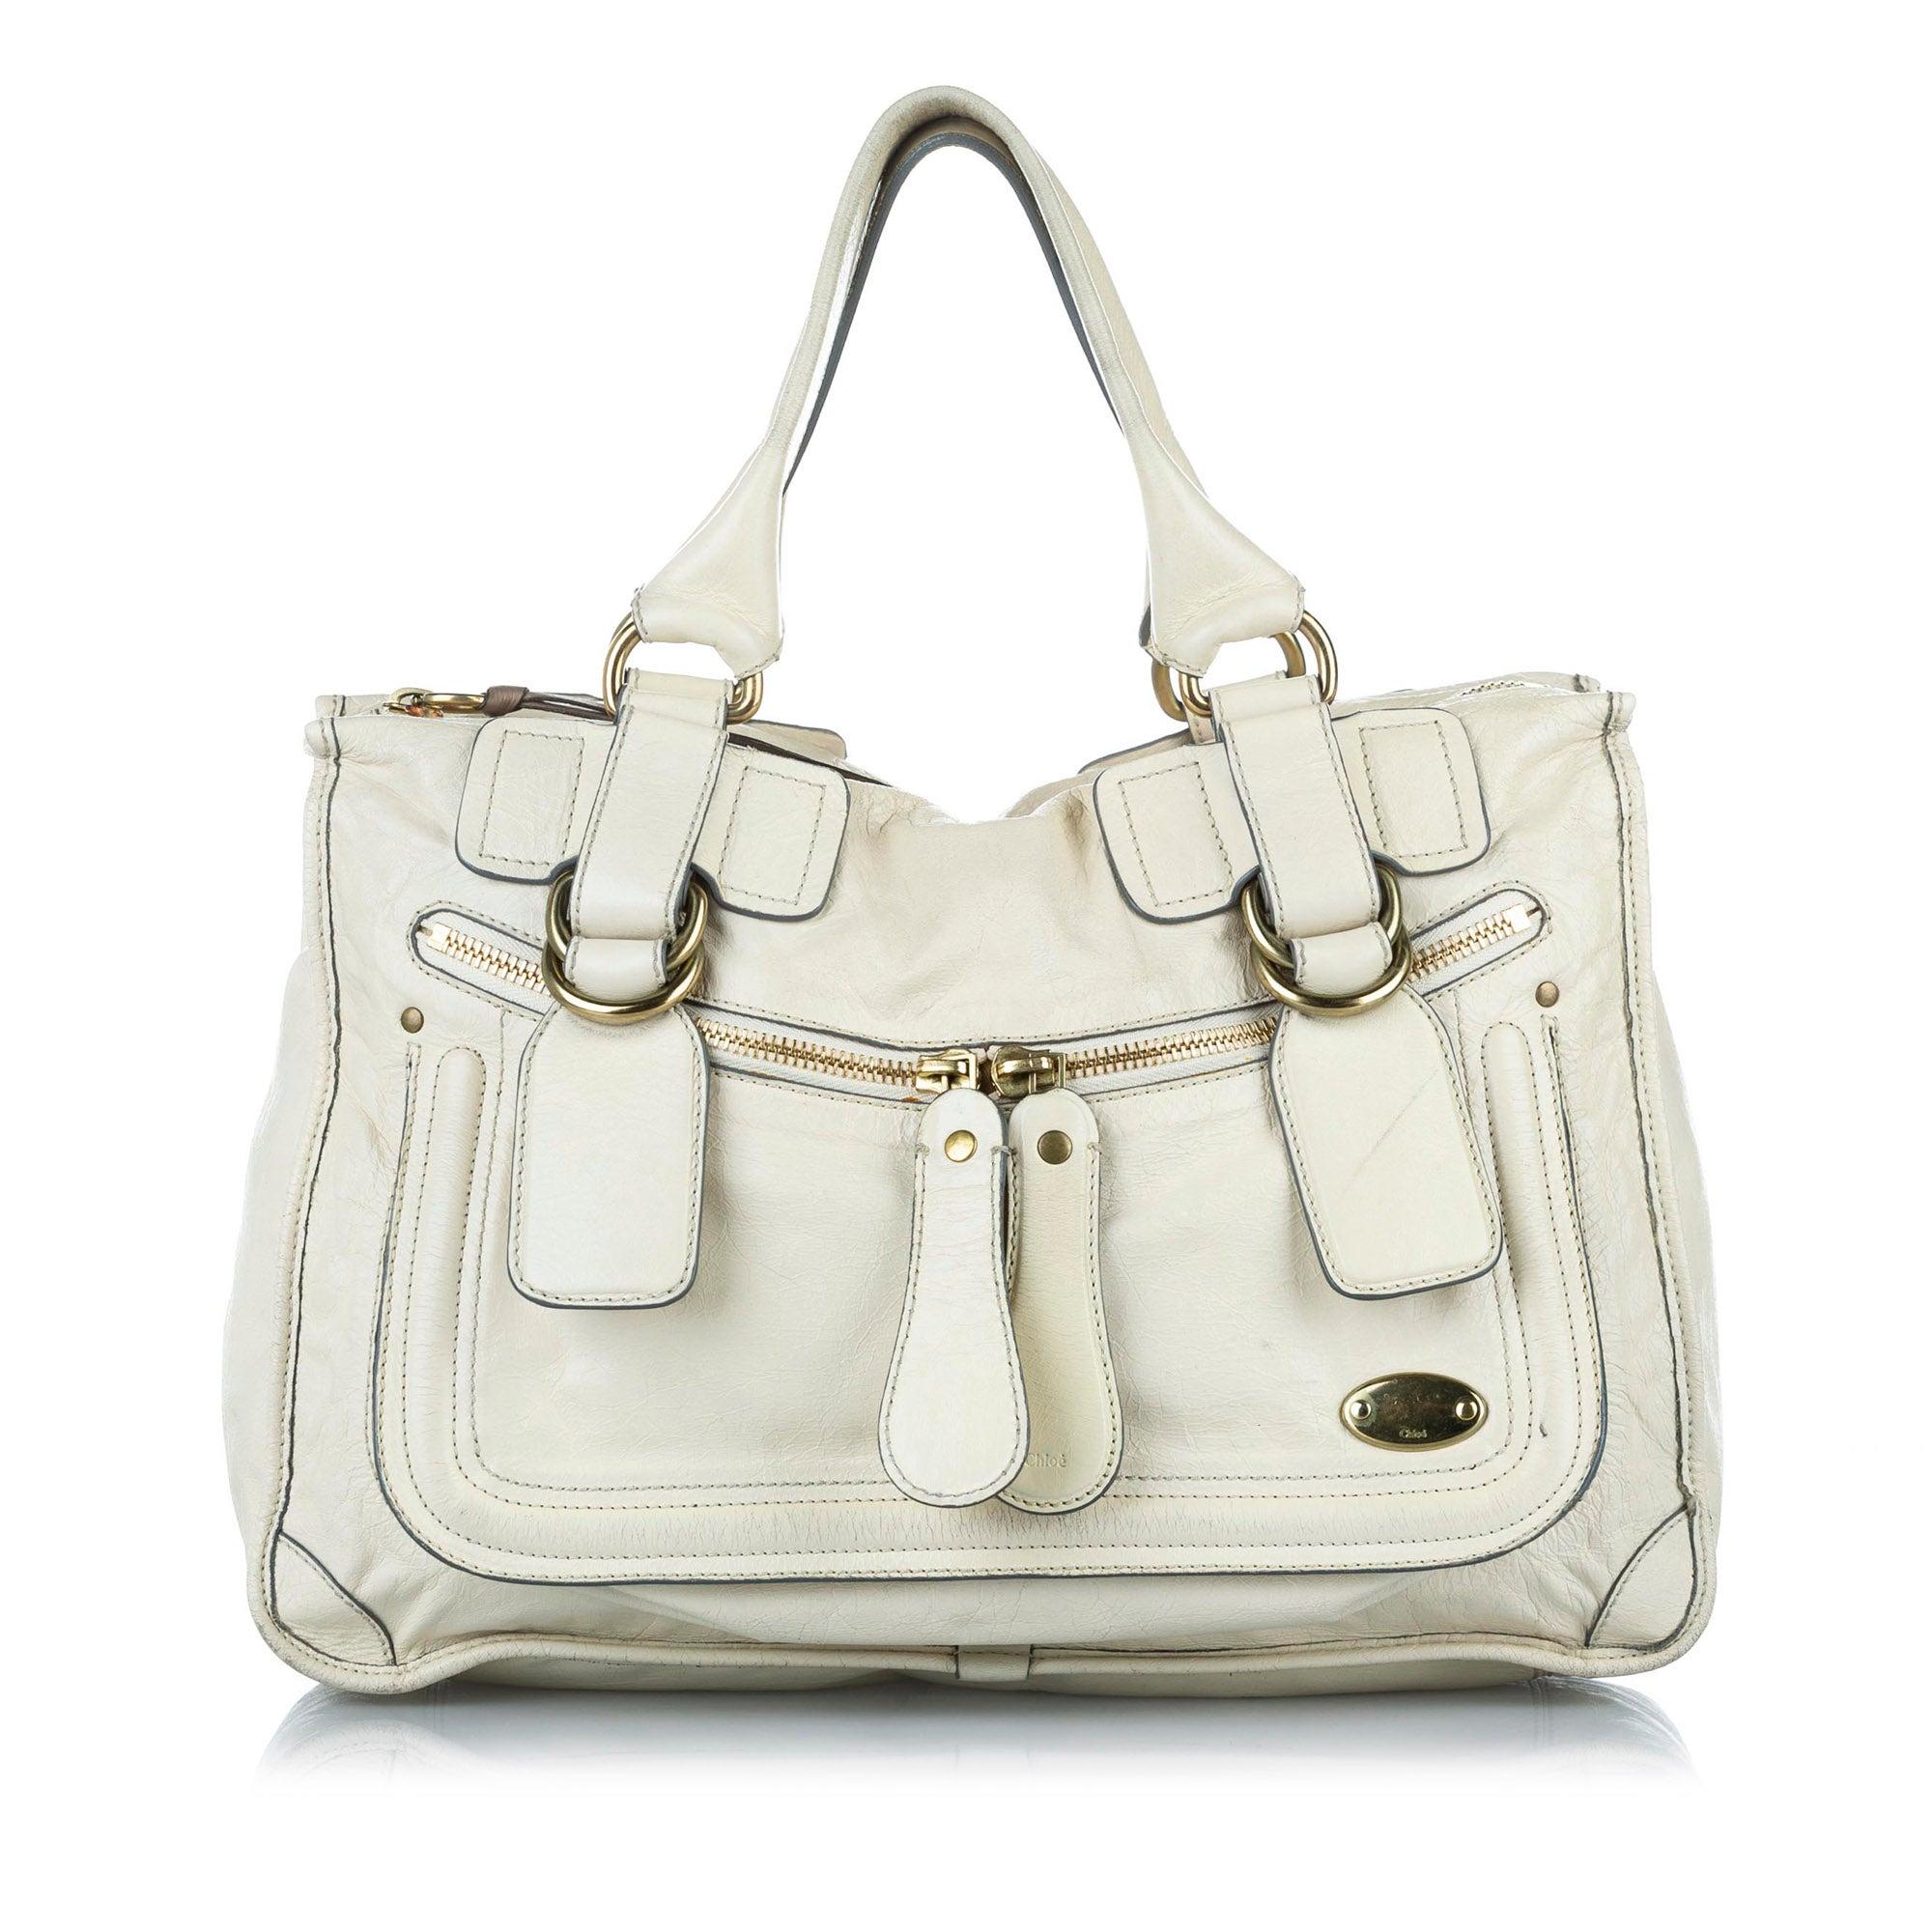 Chloe Leather Tote Bag